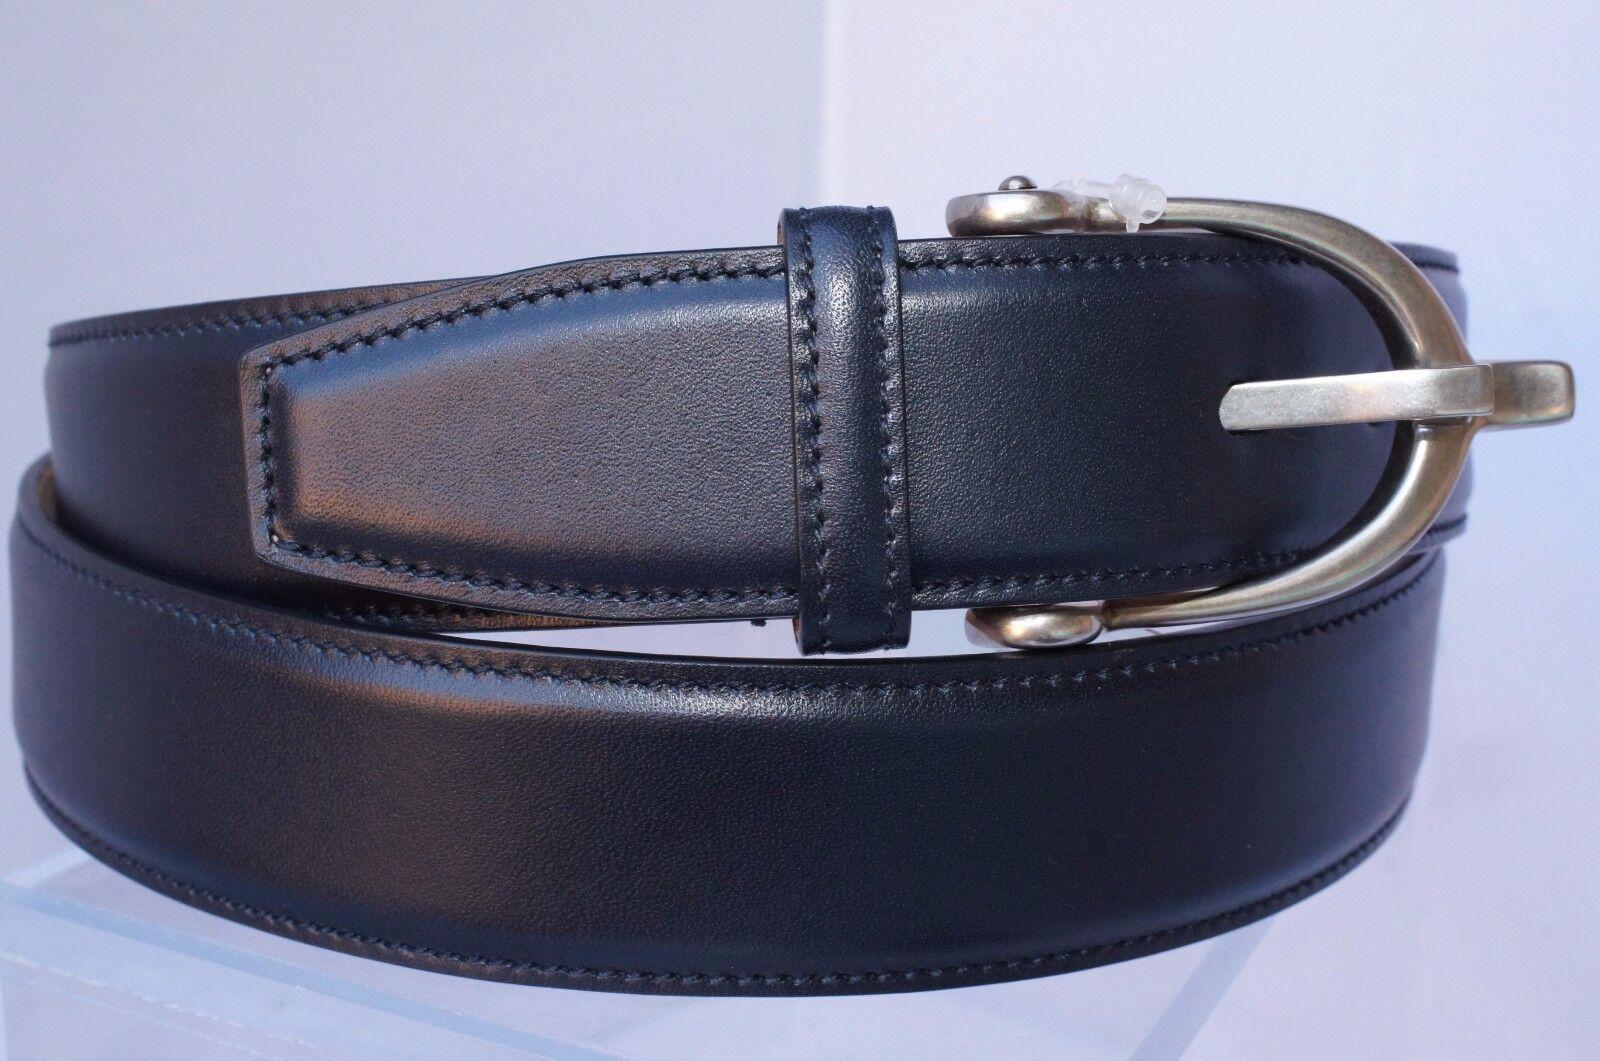 4446dac47b7 Gucci Men s Blue Belt Signature GG Logo Size 44 110 Holiday Gift